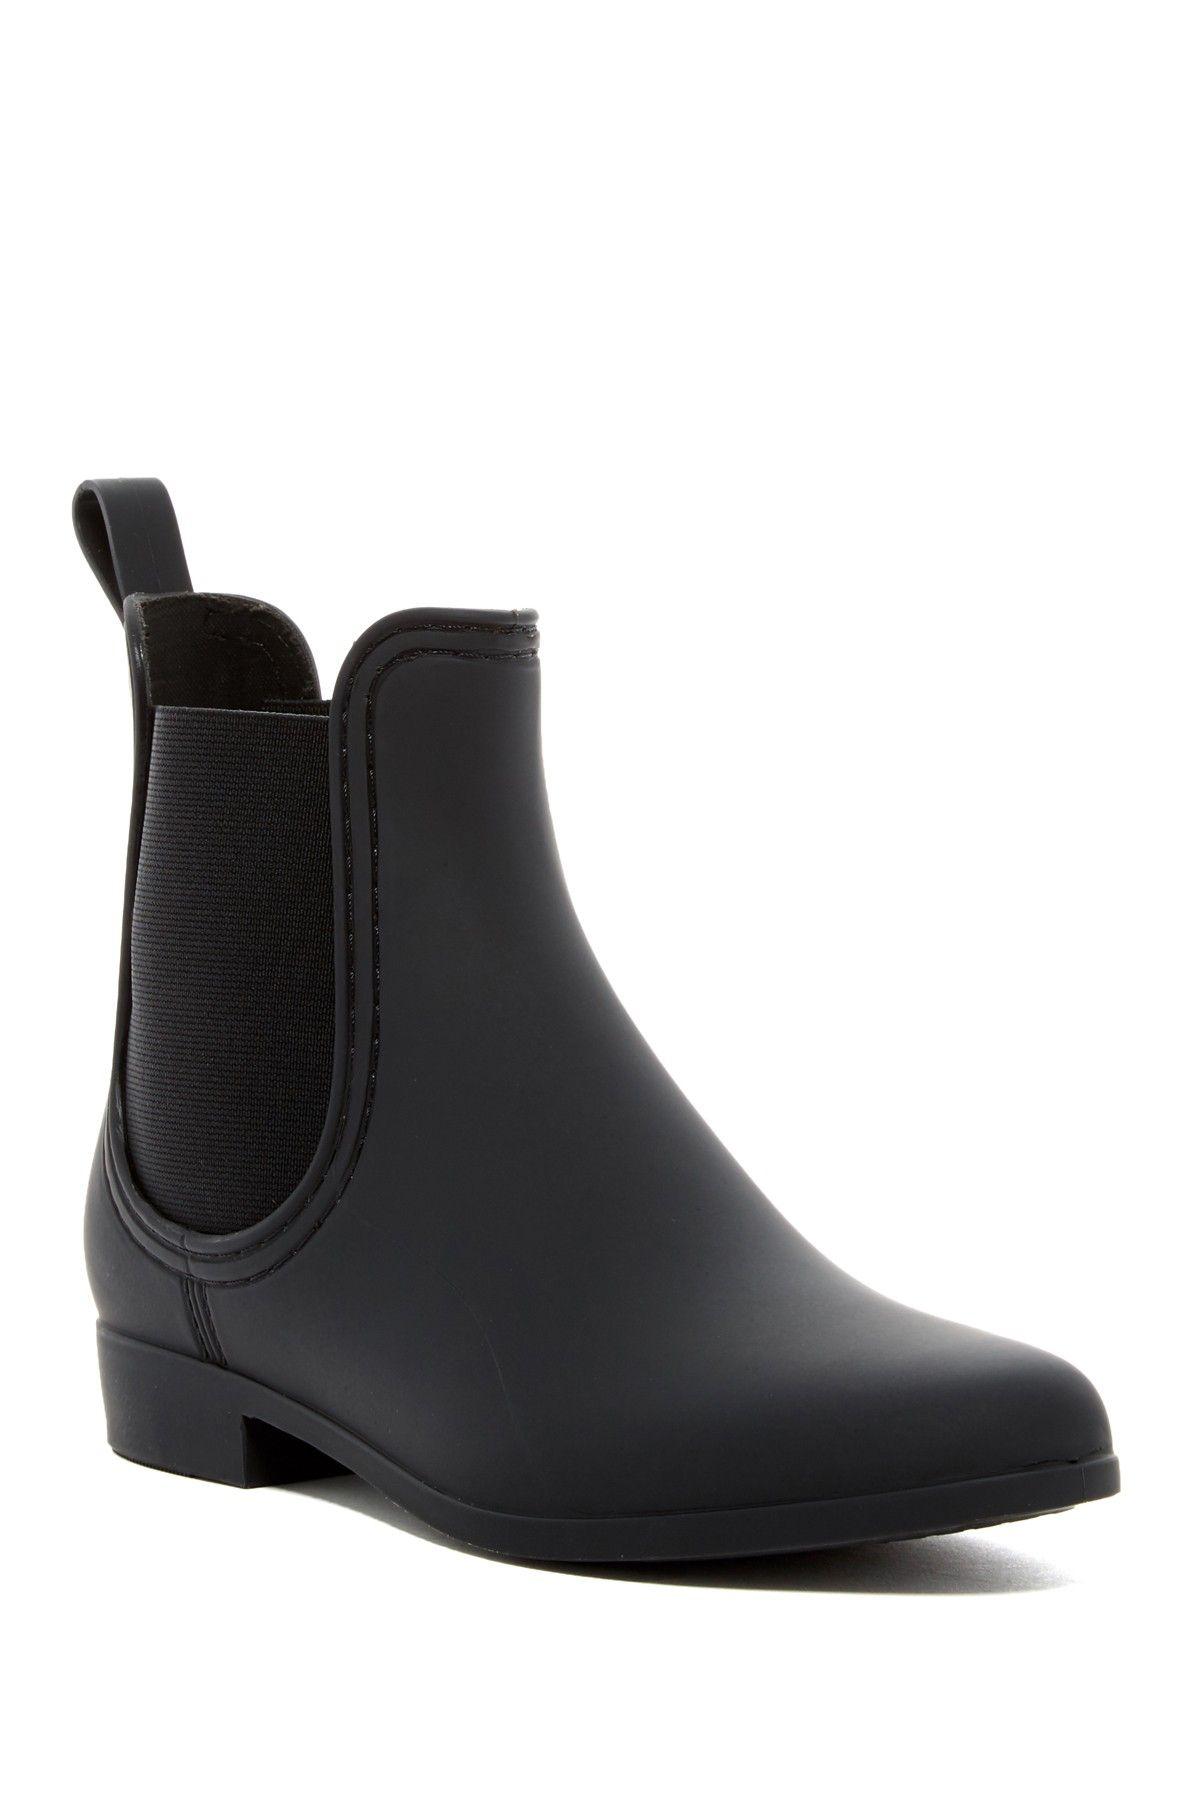 Fall Boots - Jeffrey Campbell Forecast Chelsea Waterproof Rain Boot